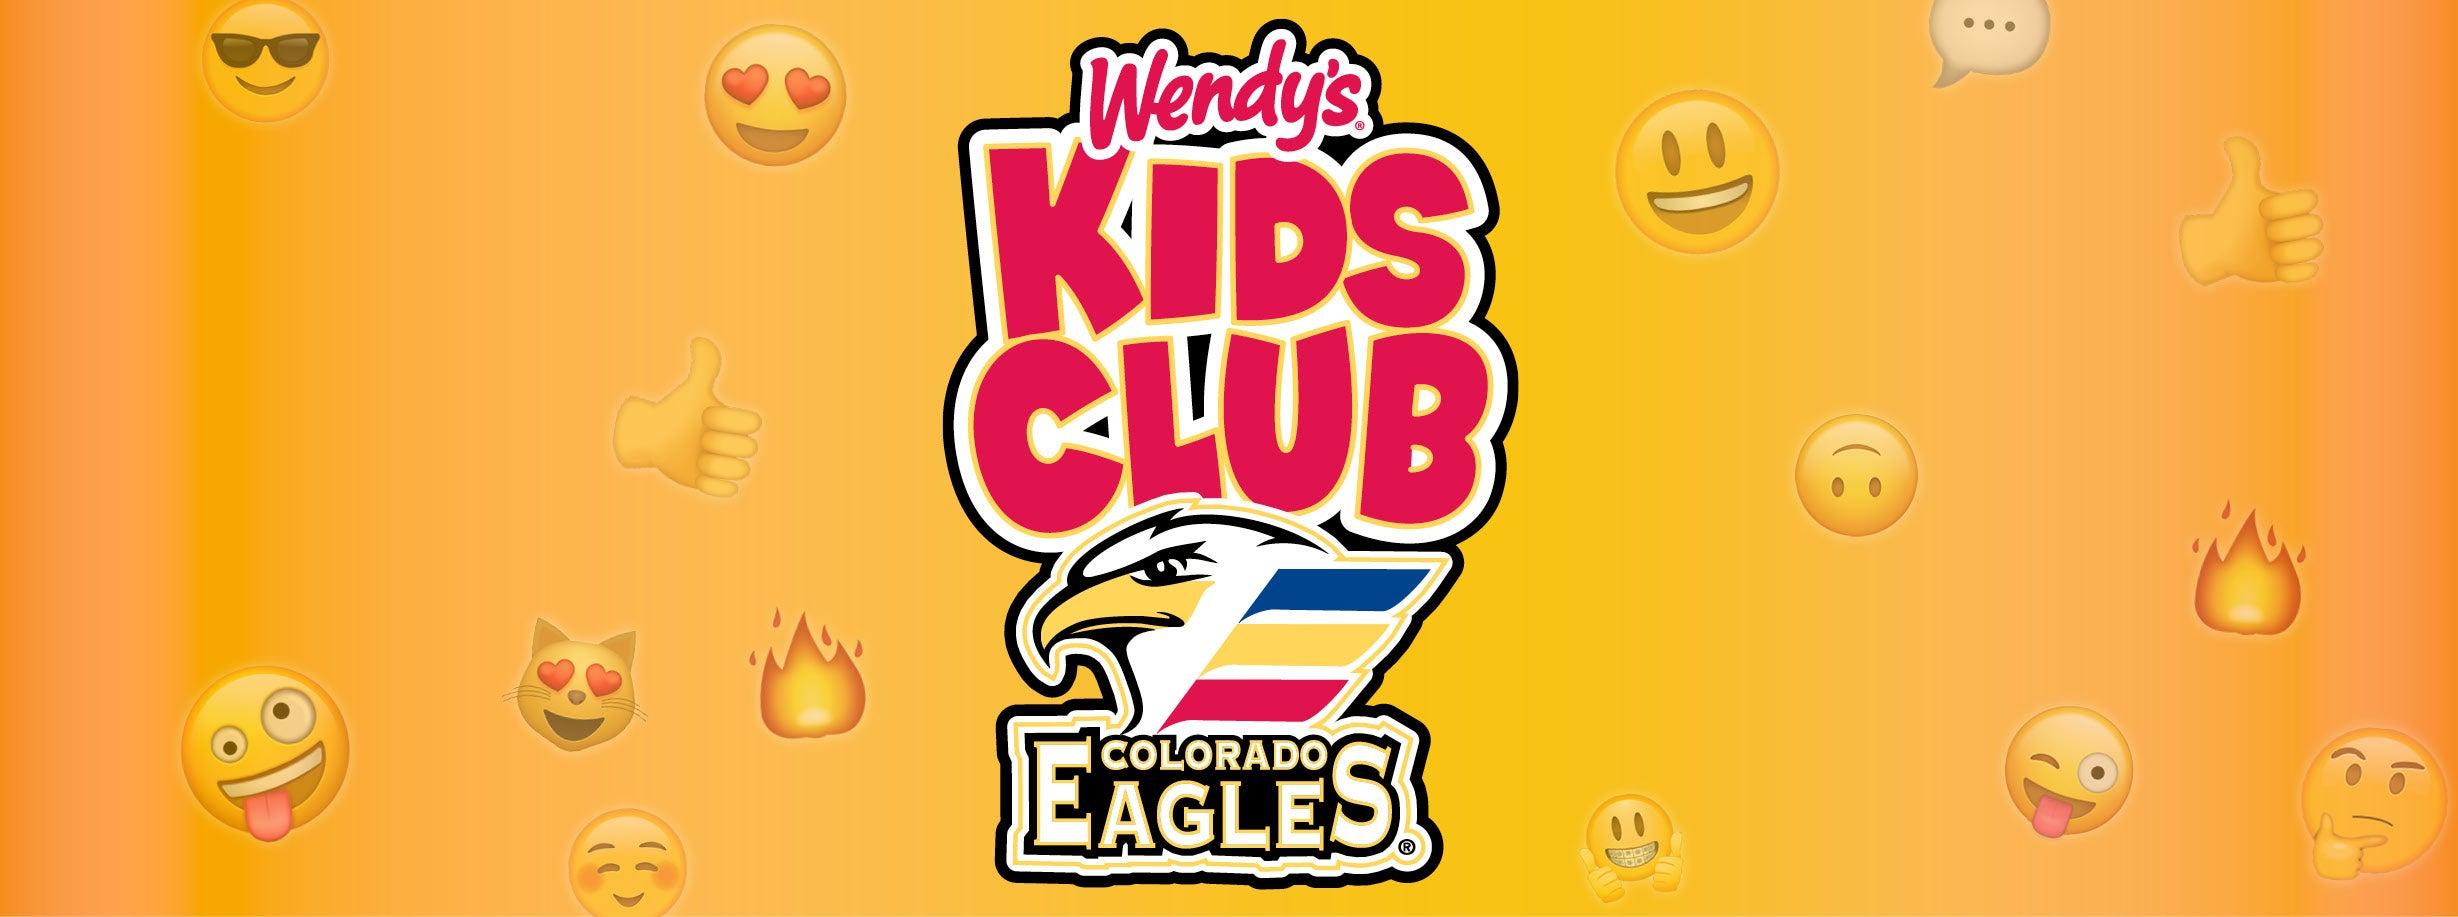 Wendy's Kids Club 2021-22